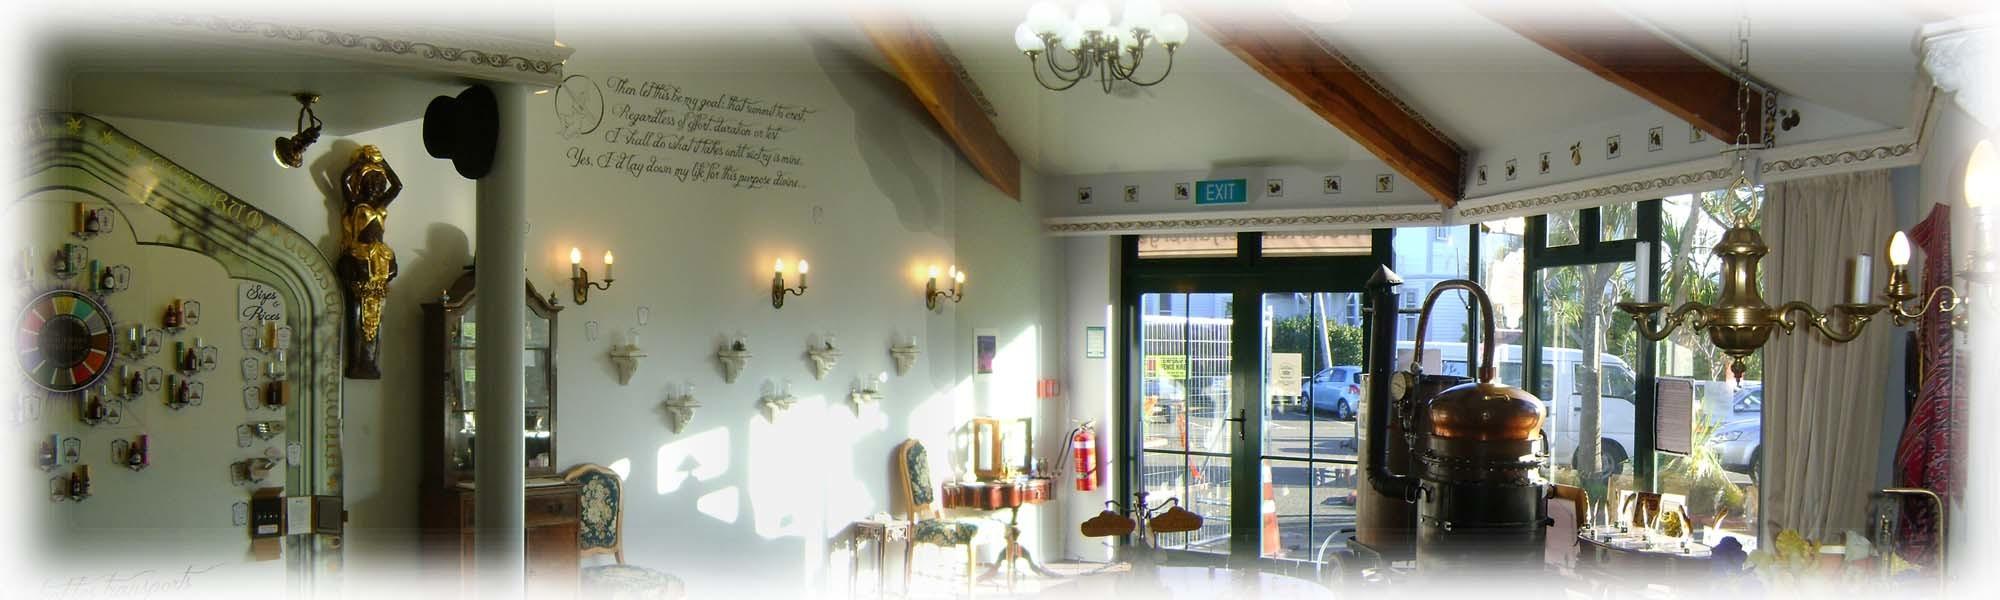 fragrifert-shop-fine-perfume-hp-gallery-1